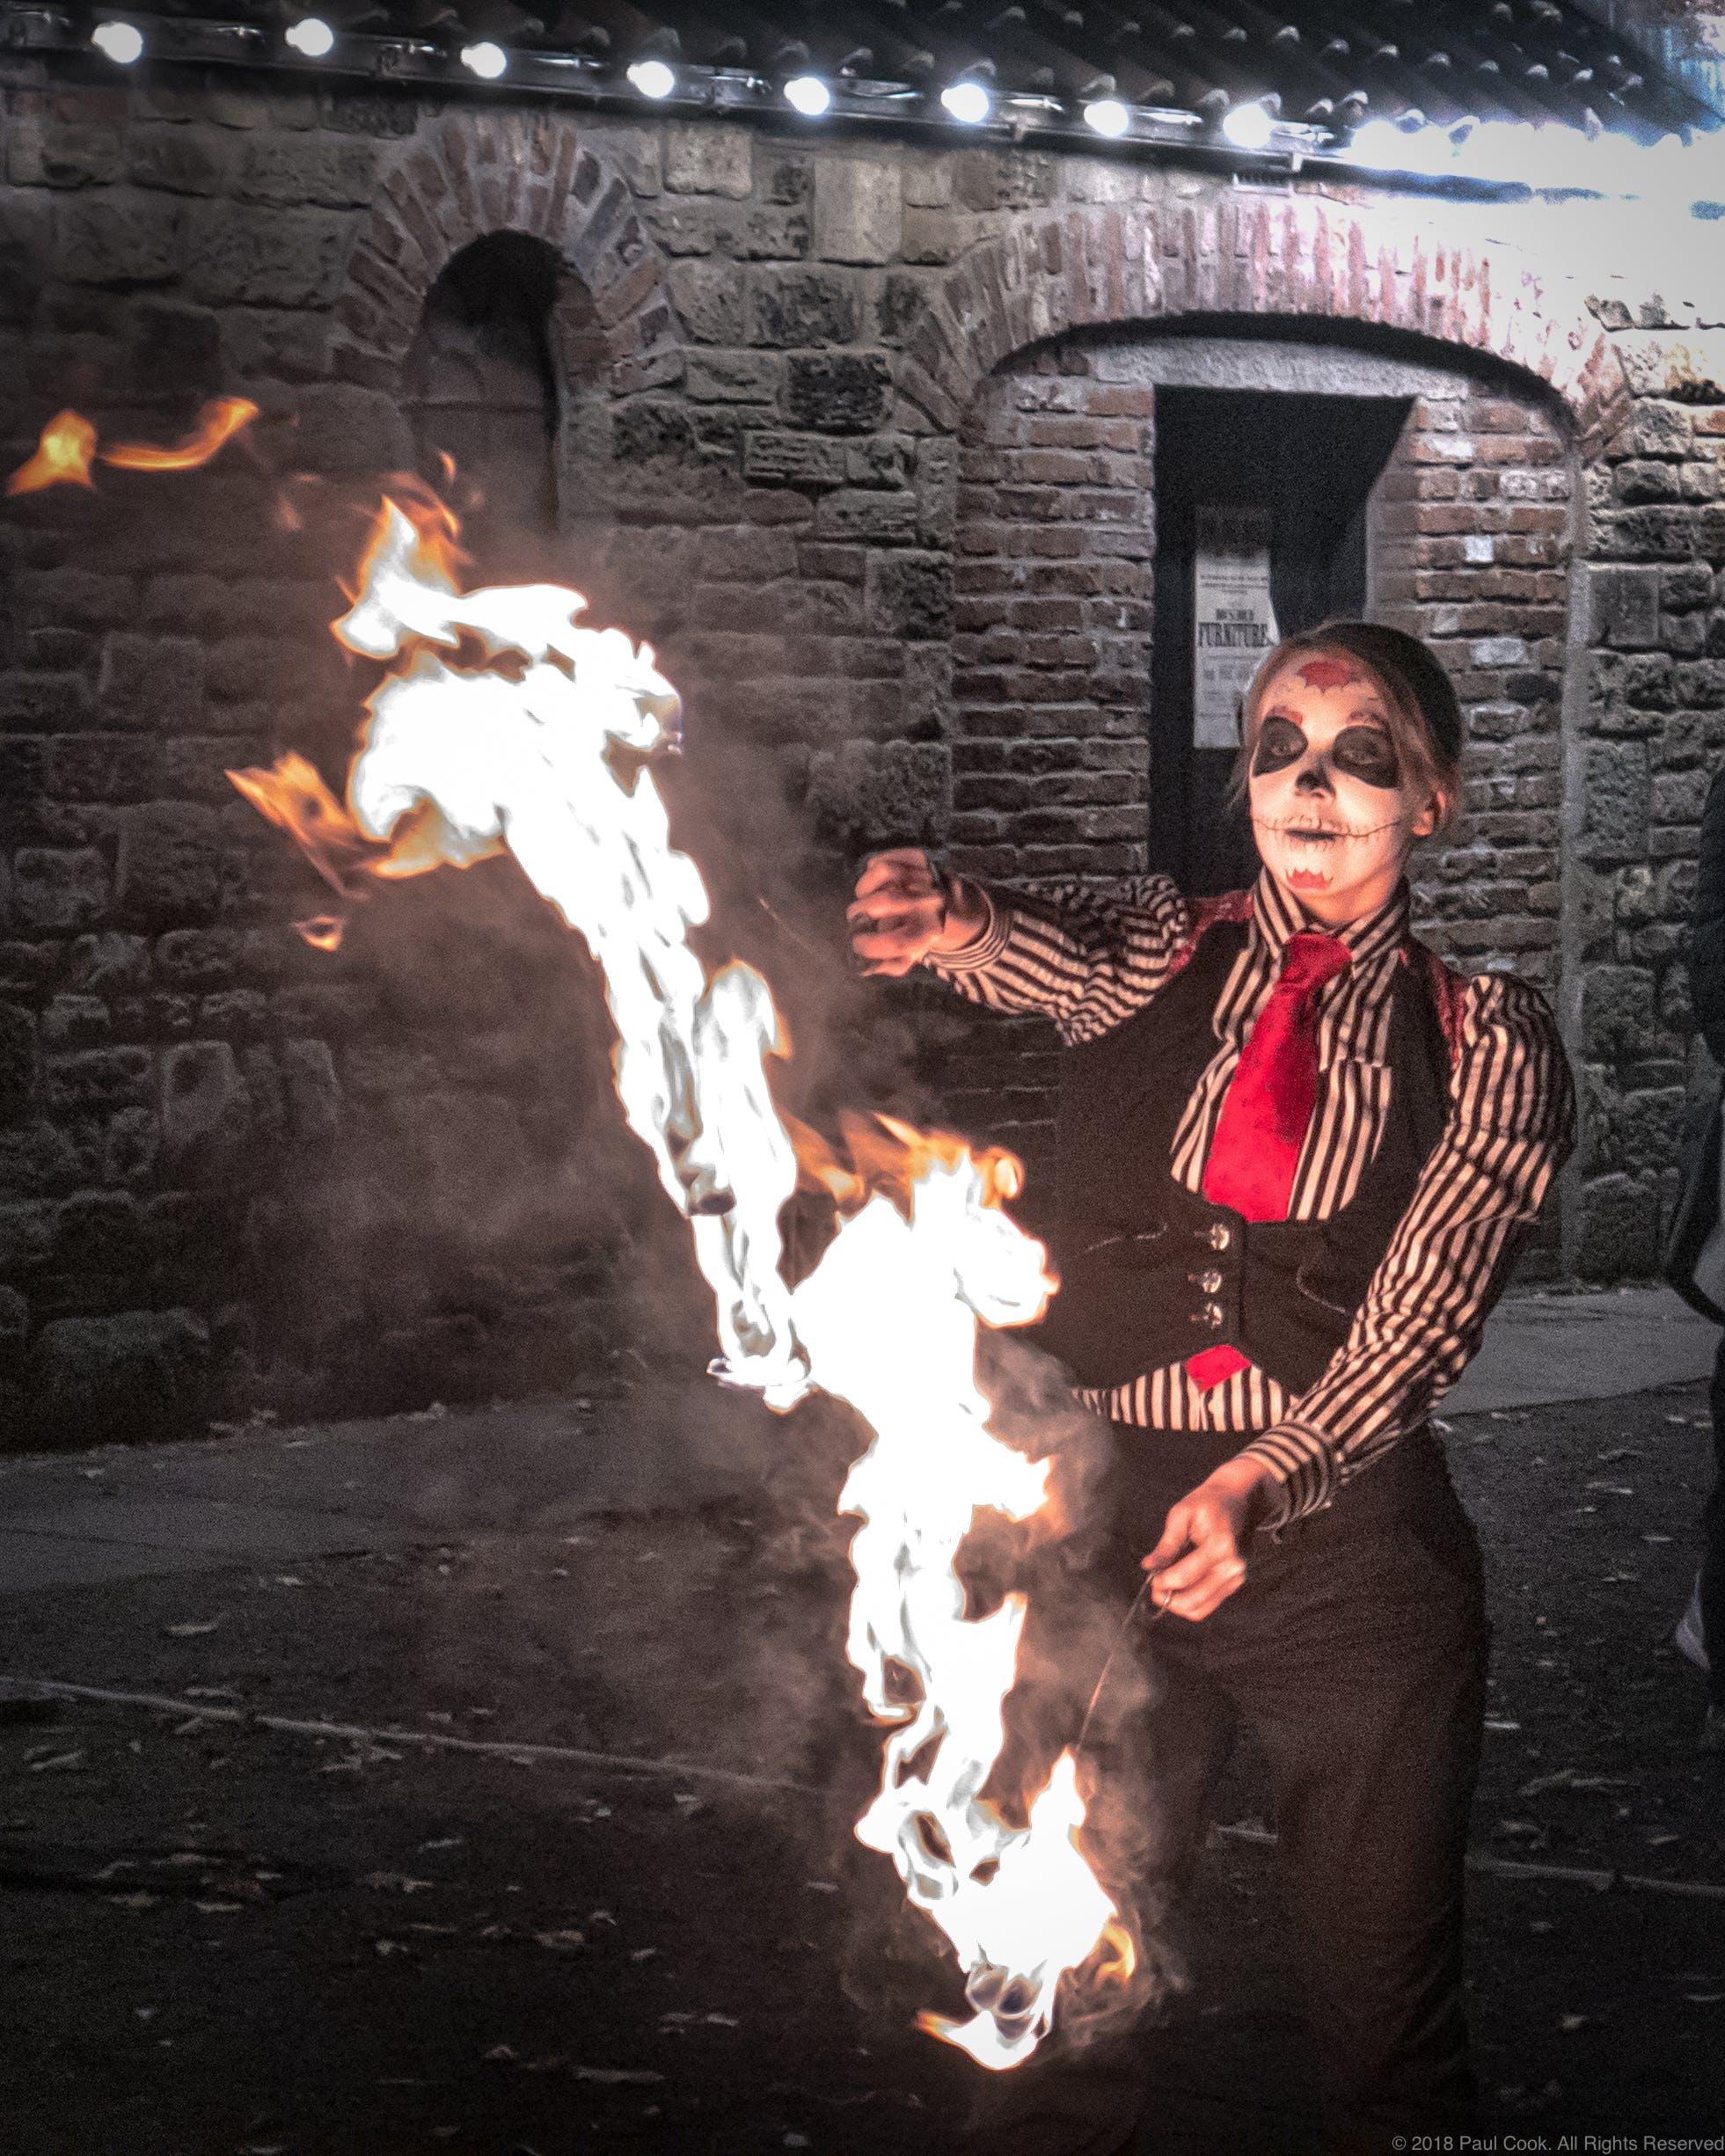 Free stock photo of danse macabre, fire, halloween, sugar skull